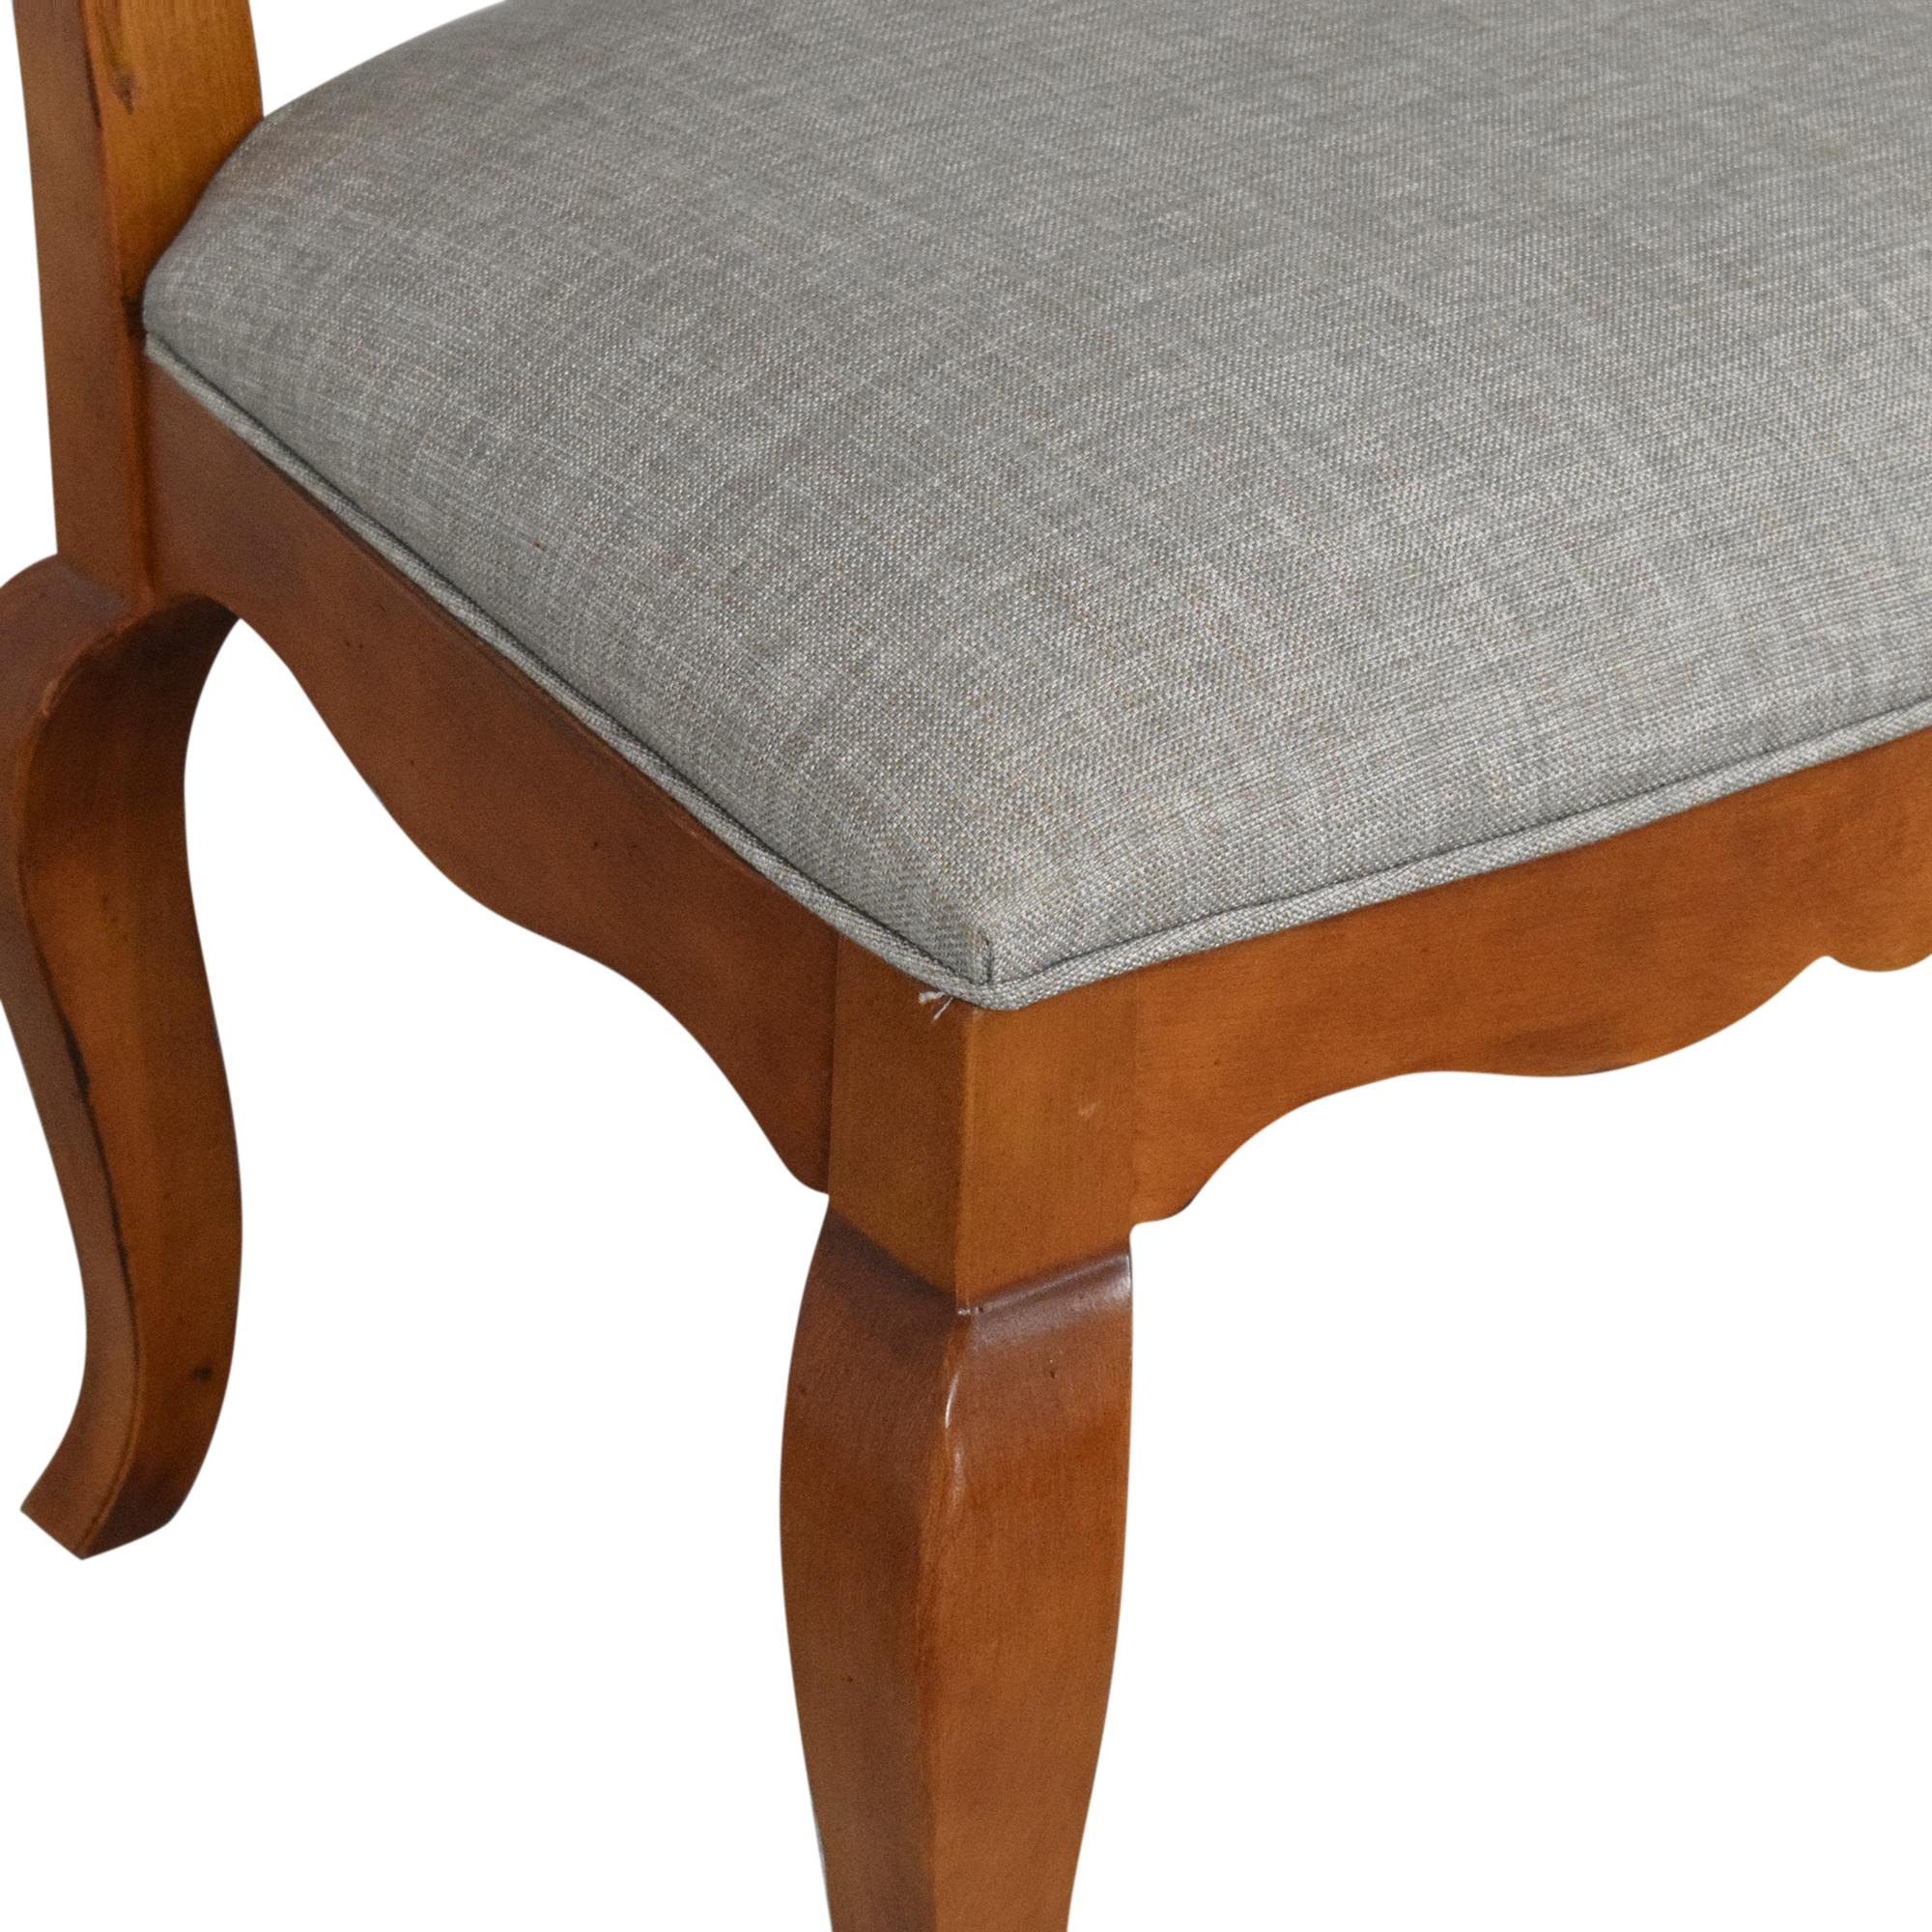 Ethan Allen Ethan Allen Legacy Dining Chairs nj